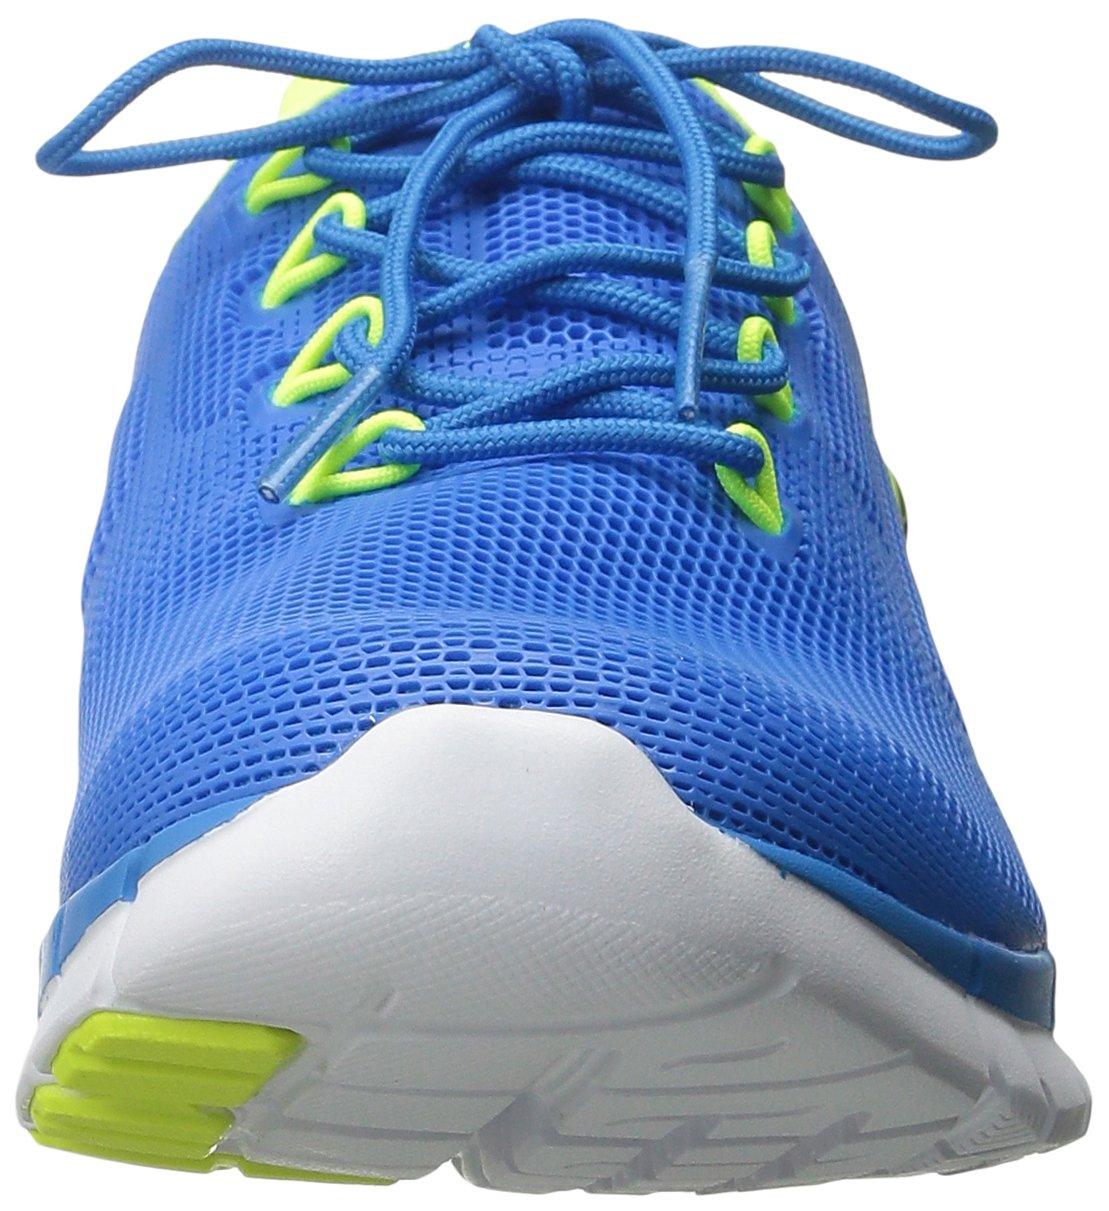 71wYwC4ZexL - Reebok Women's Z Pump Fusion Polyurethane Running Shoe